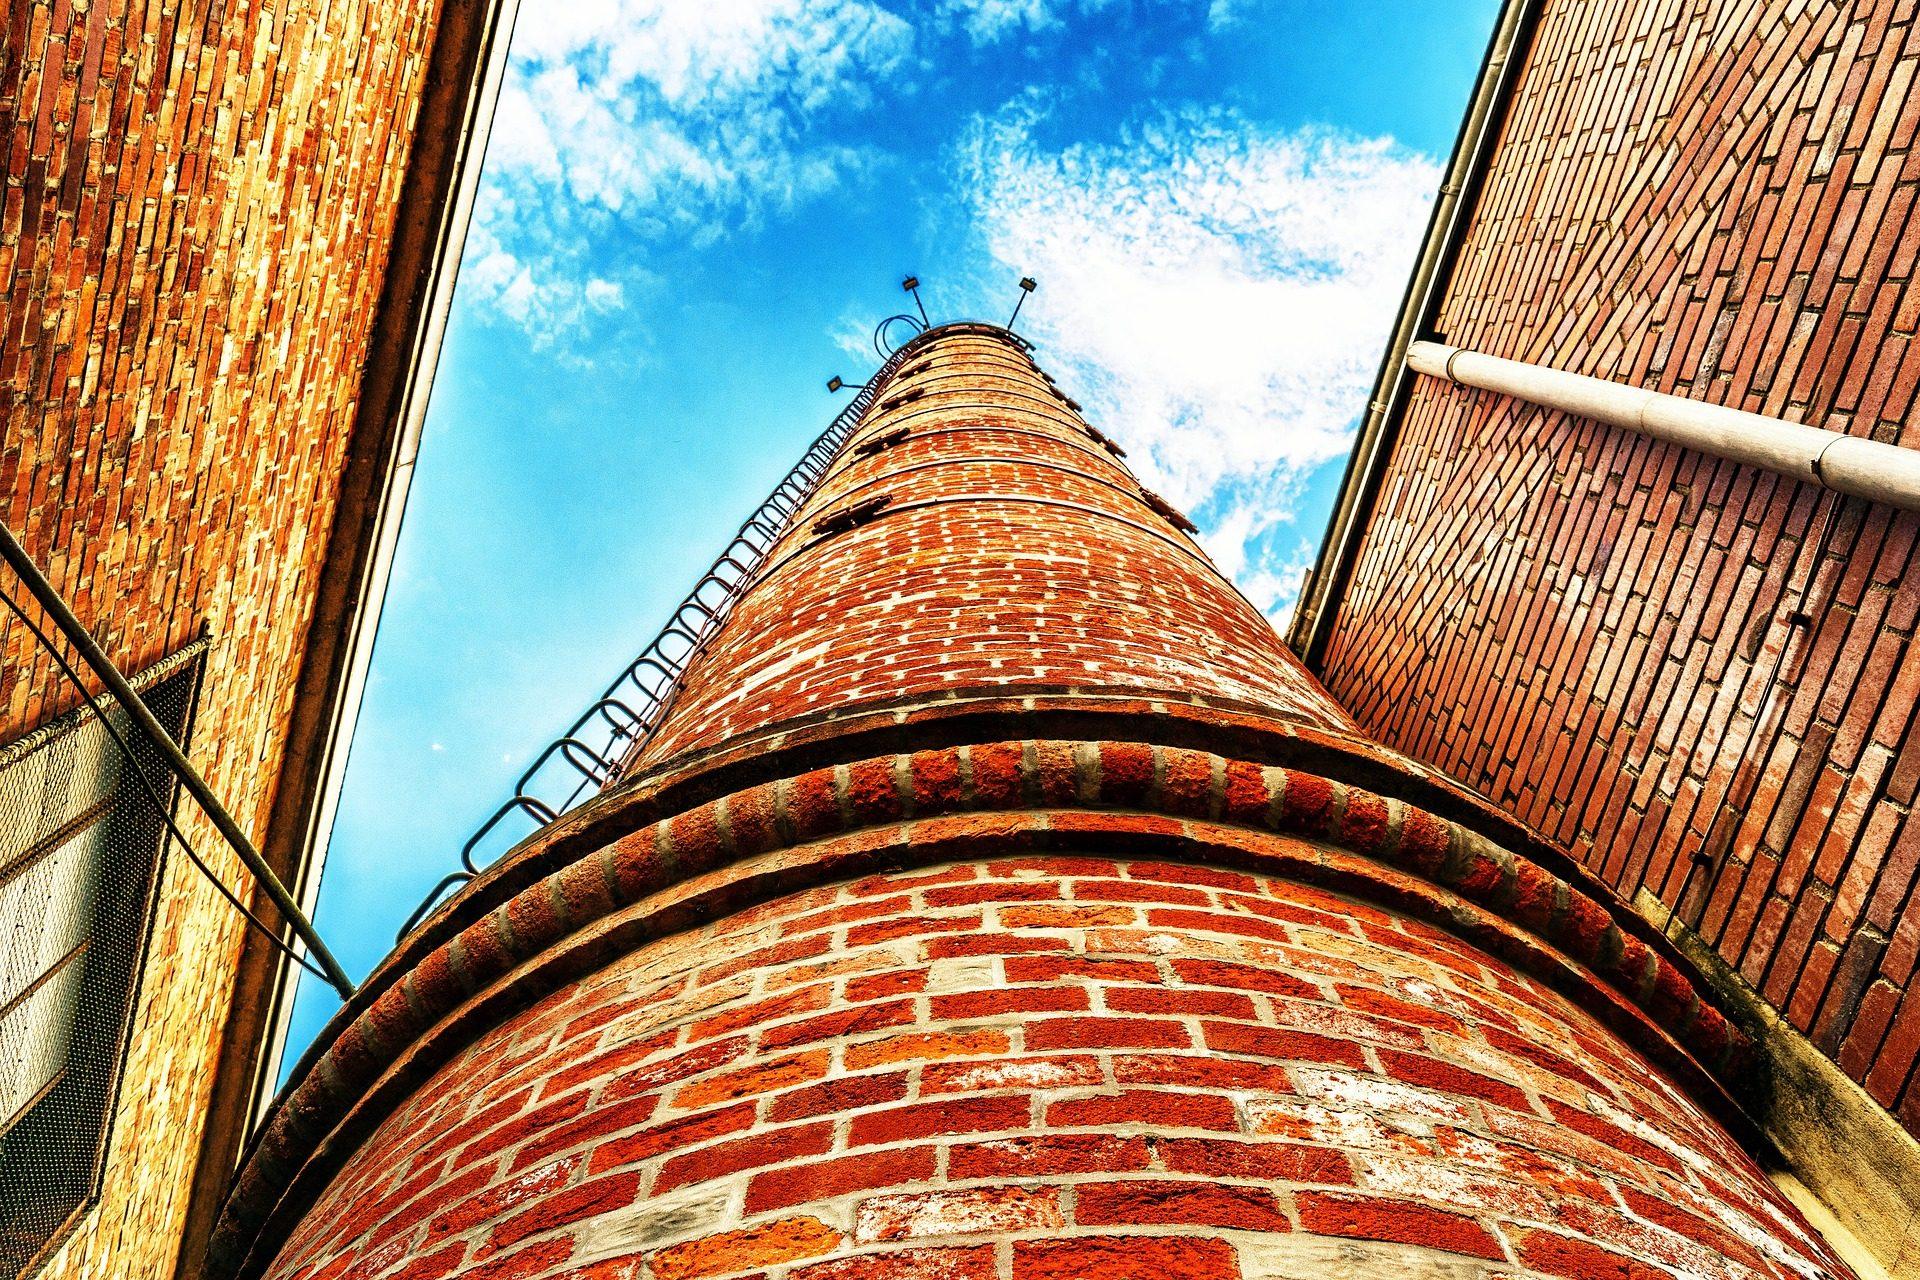 Turm, Kamin, Ziegel, Treppen, Himmel, Wolken - Wallpaper HD - Prof.-falken.com